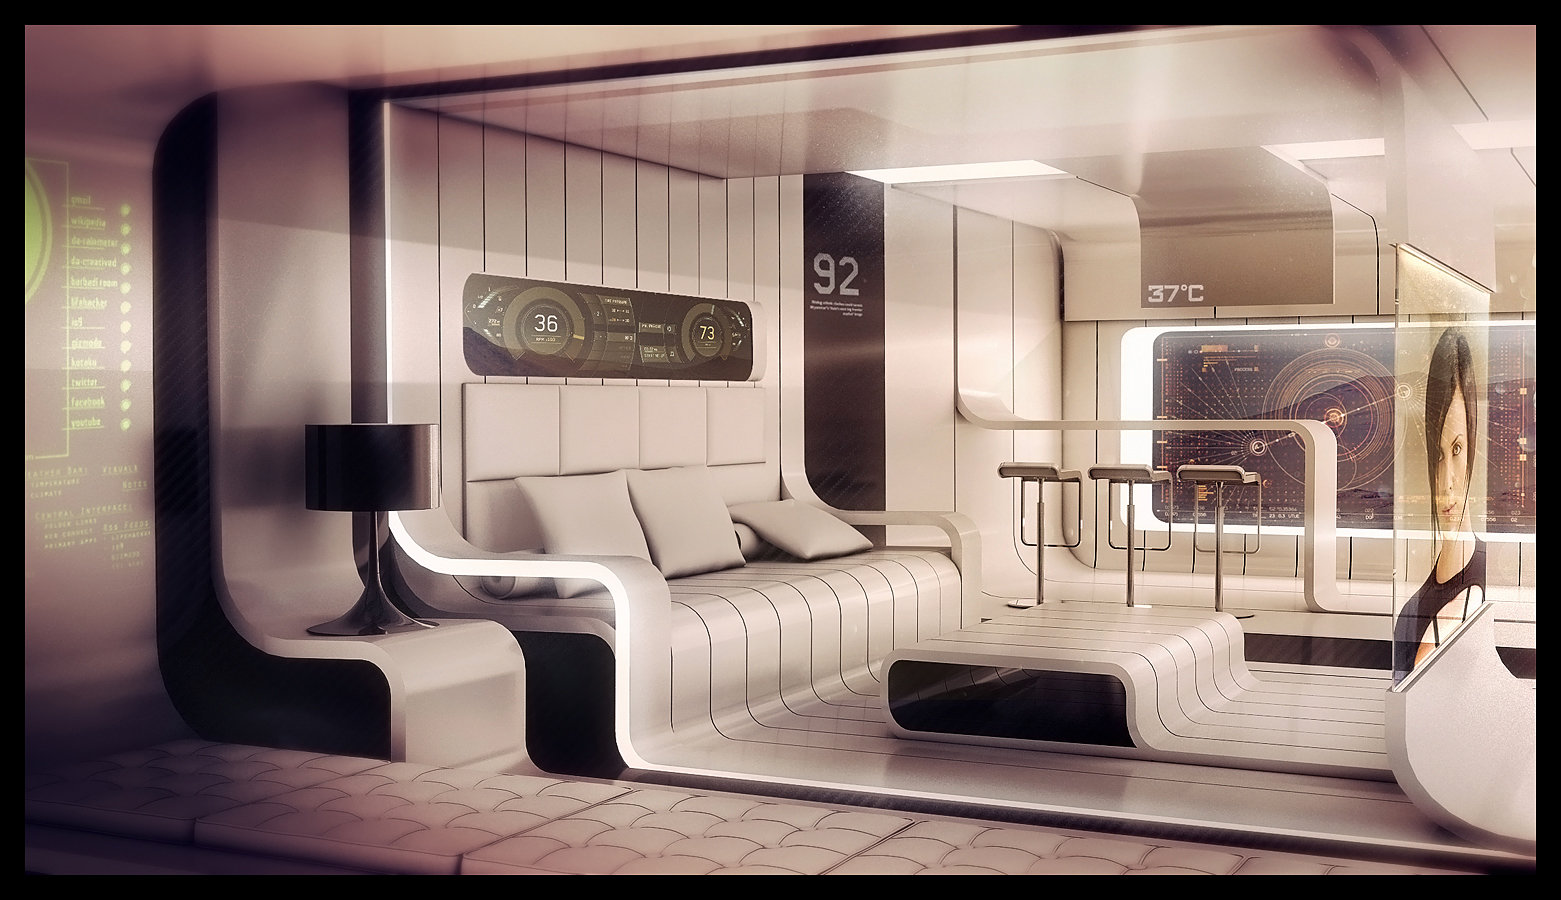 Superb Futuristic 3d Sci Fi Art By Encho Enchev Concept